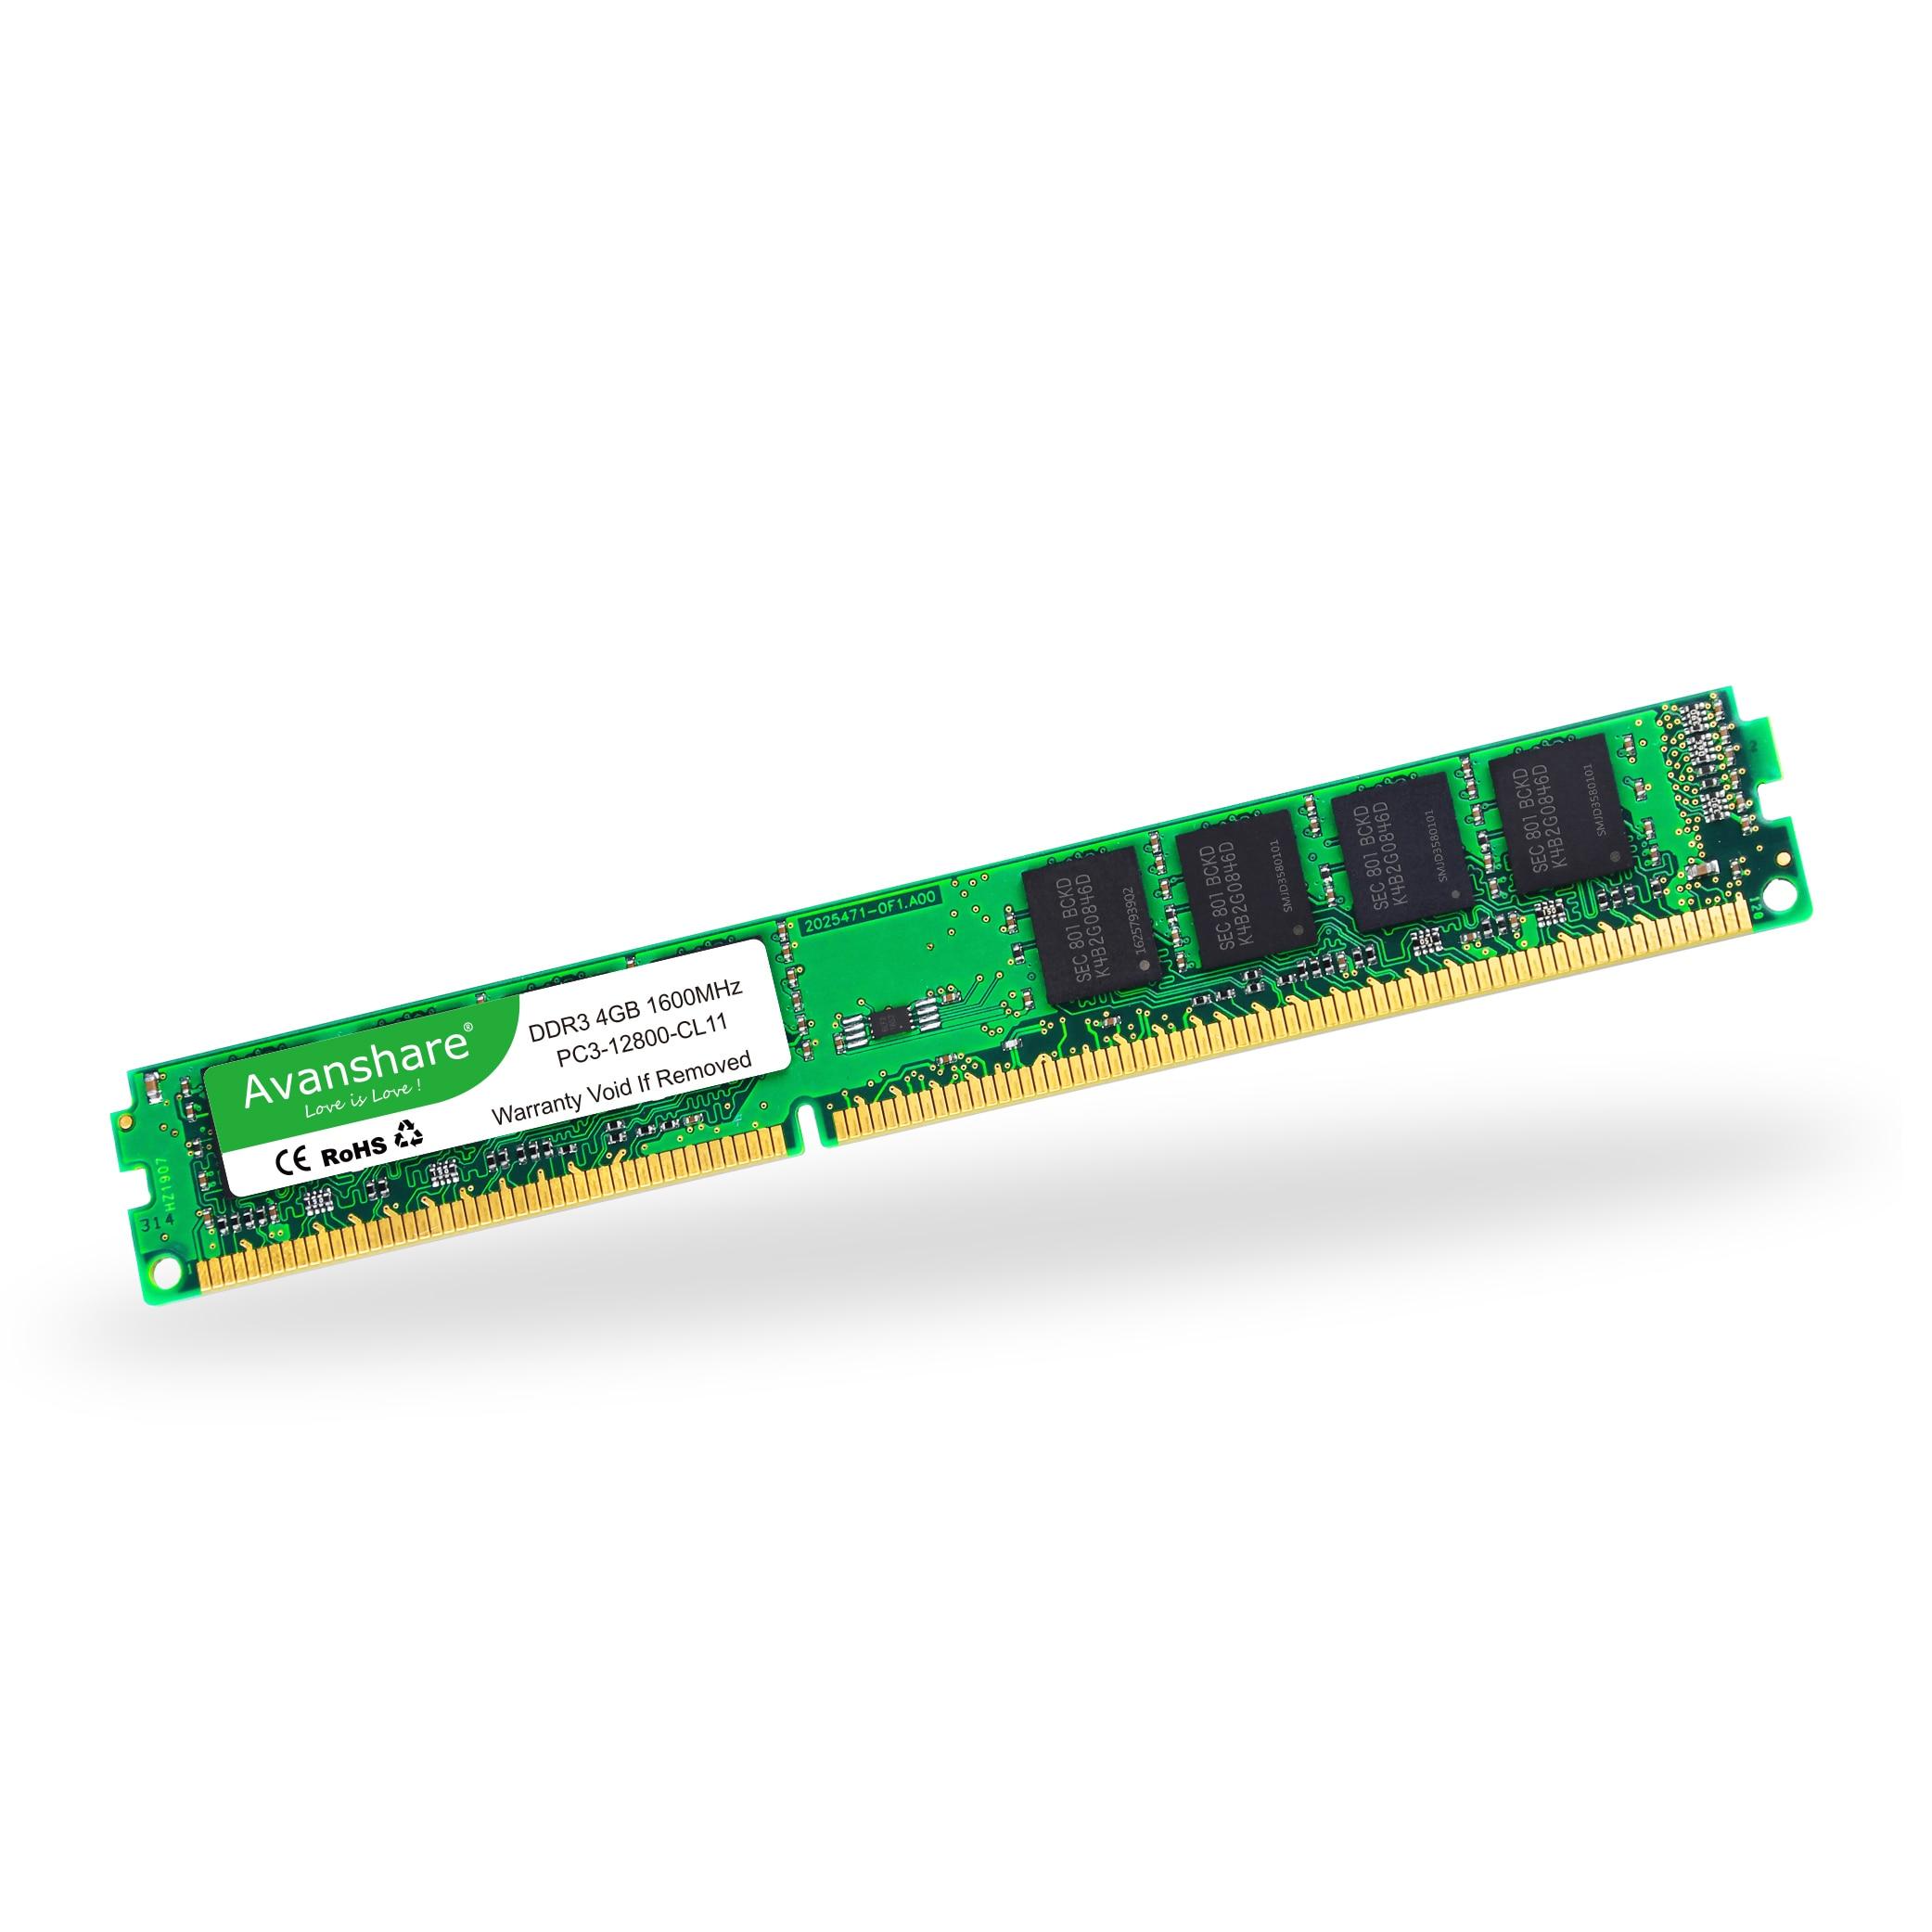 Avanshare Ram DDR3 4GB 2GB 1333MHZ 1600MHz Desktop Memory 240pin 1.5V DIMM Intel AMD